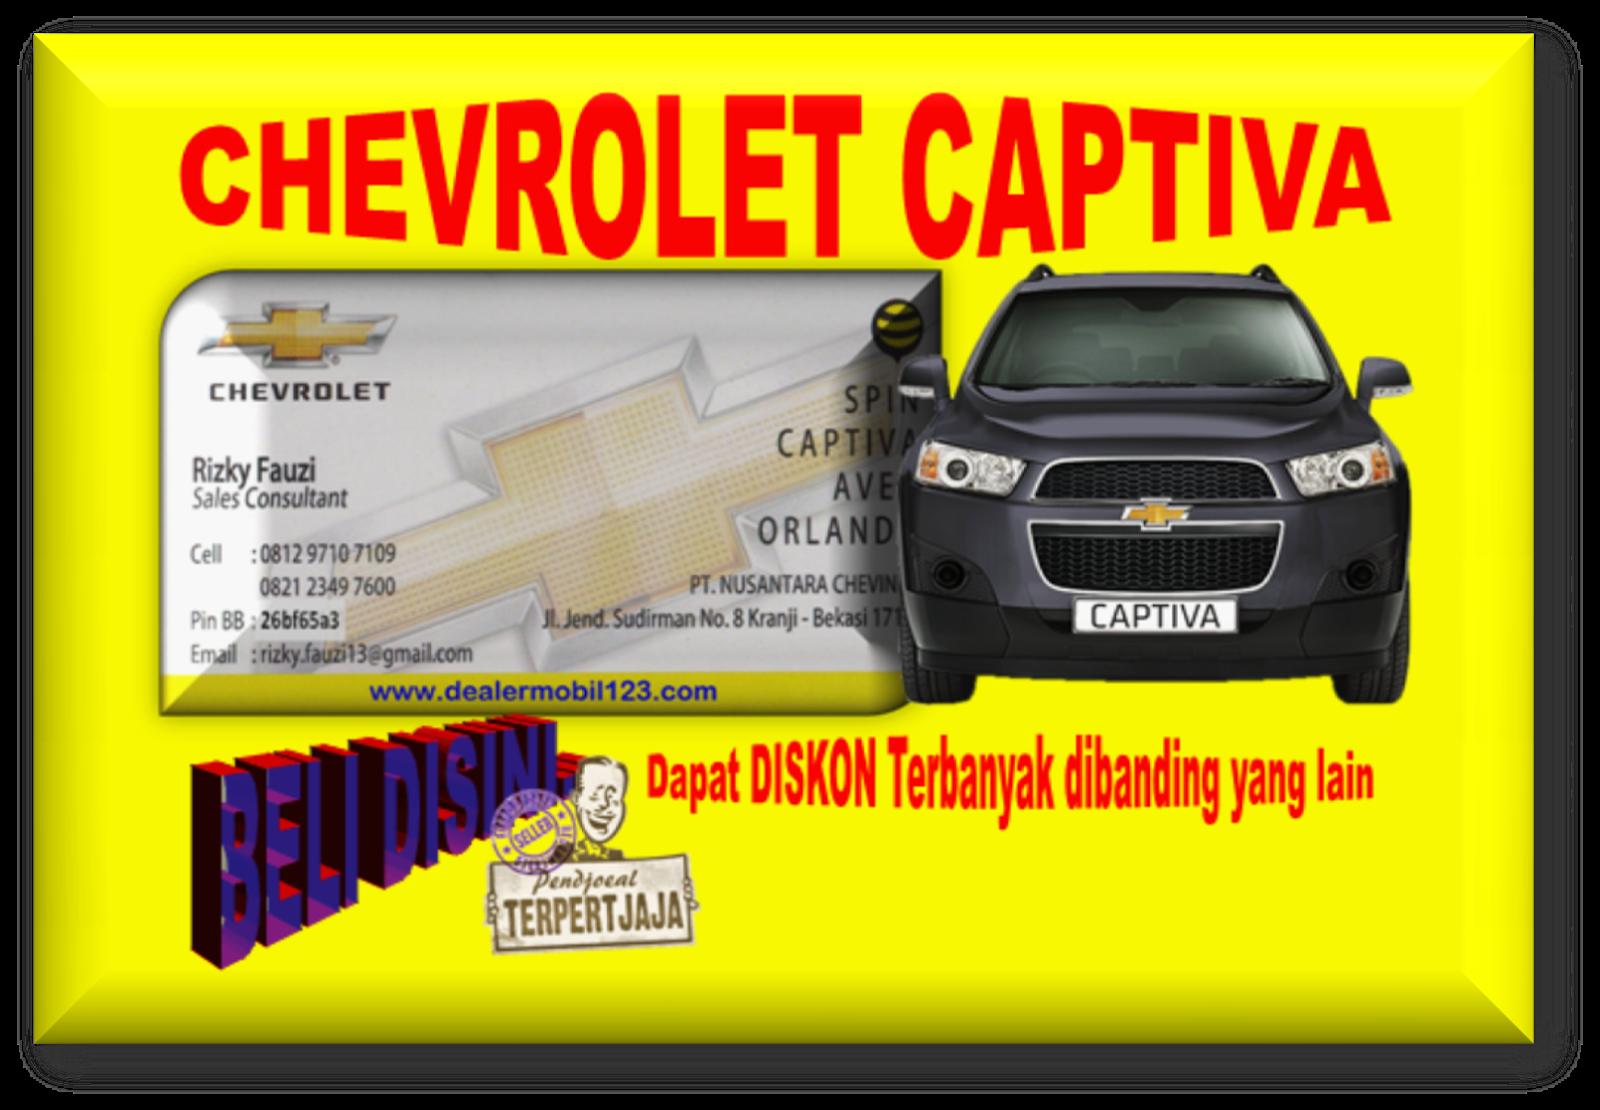 Chevrolet Captiva Diskon Terbanyak 0812 9710 7109